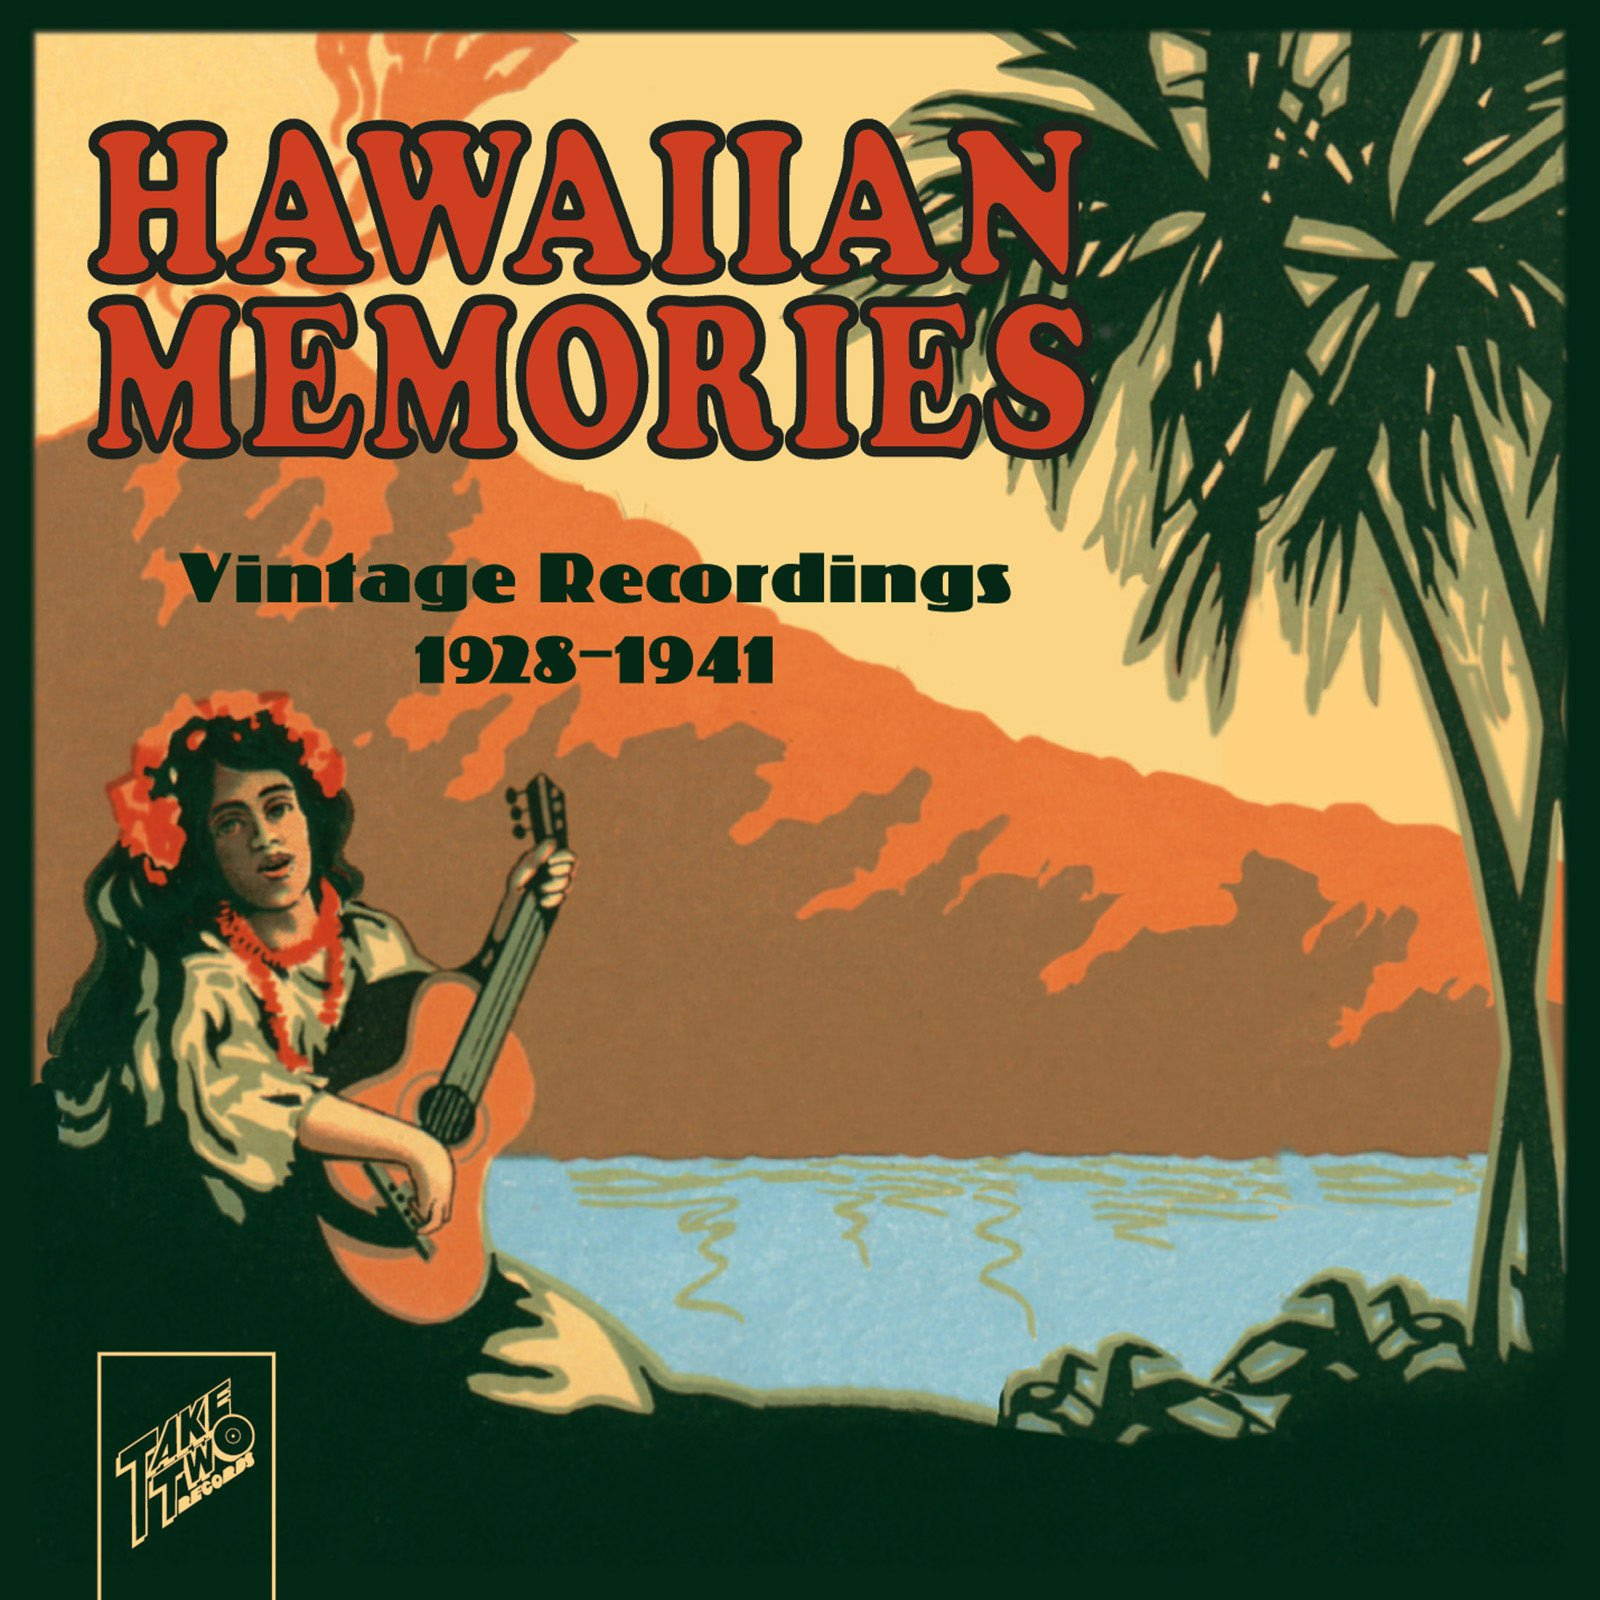 Hawaiian Memories: Vintage Recordings 1928-1941